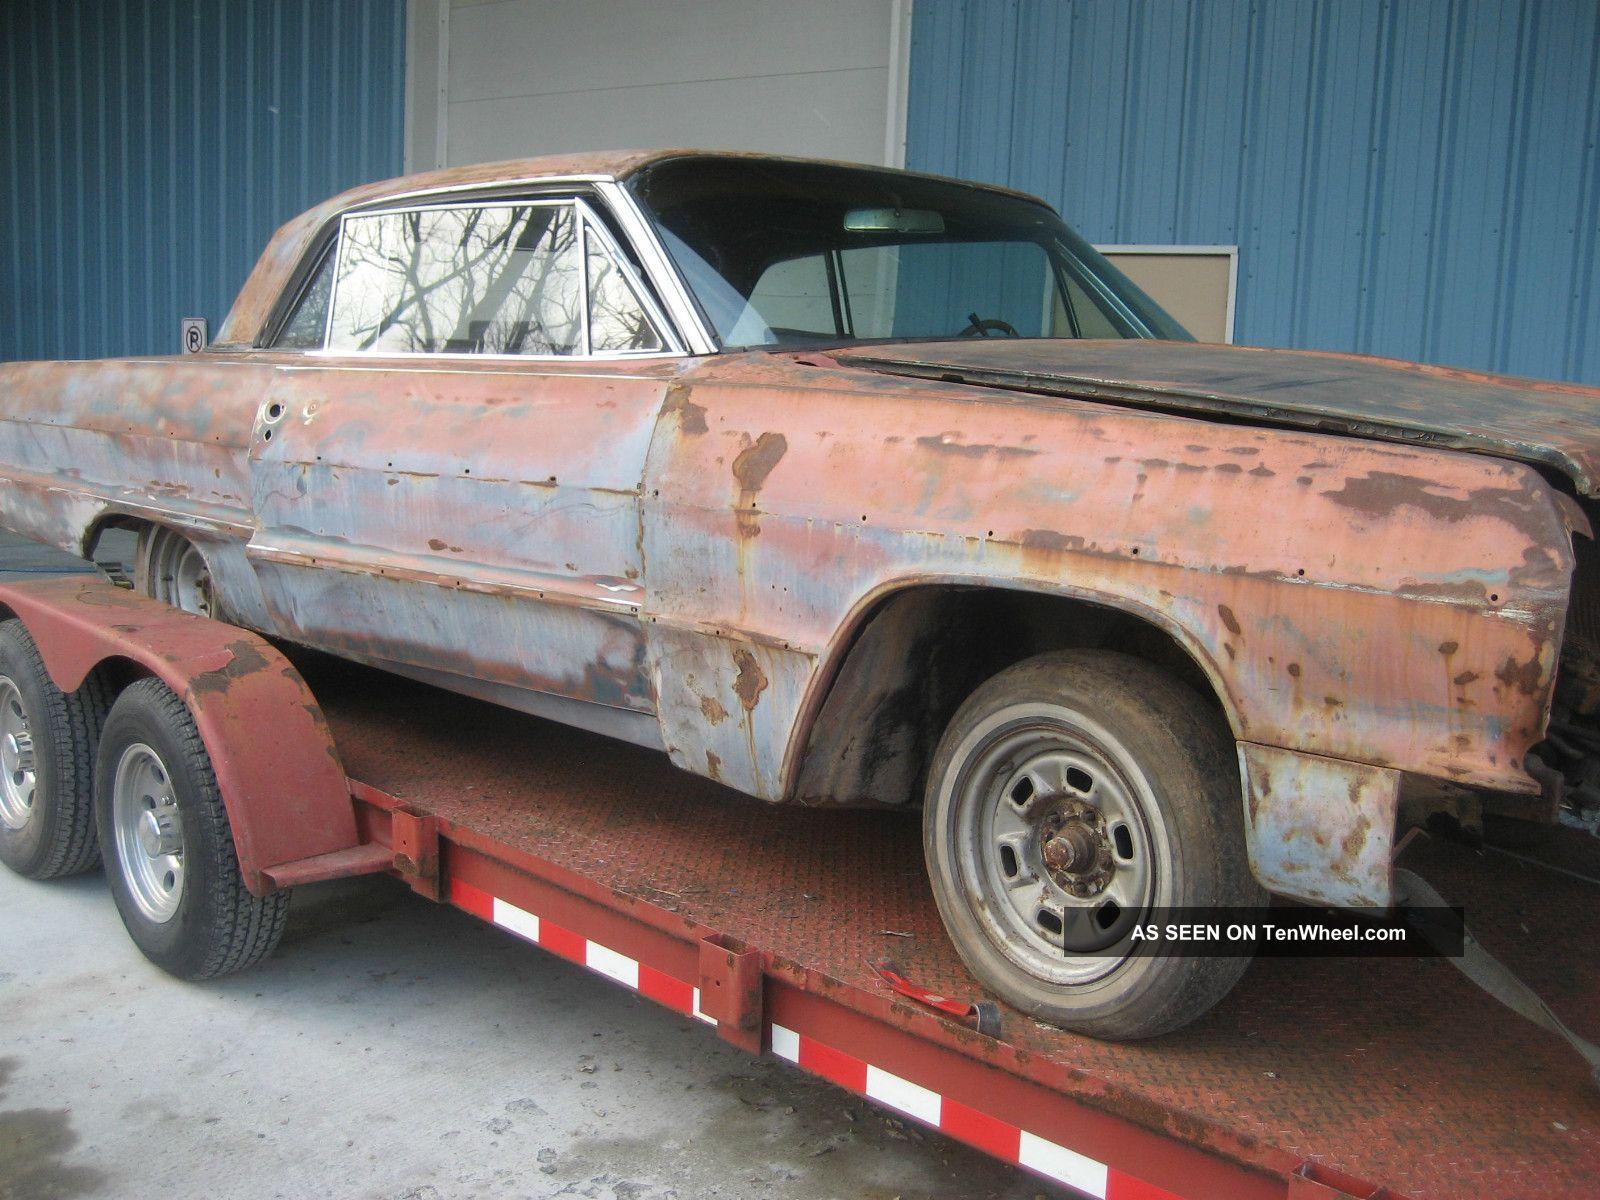 1964 Chevy Impala, Project Car